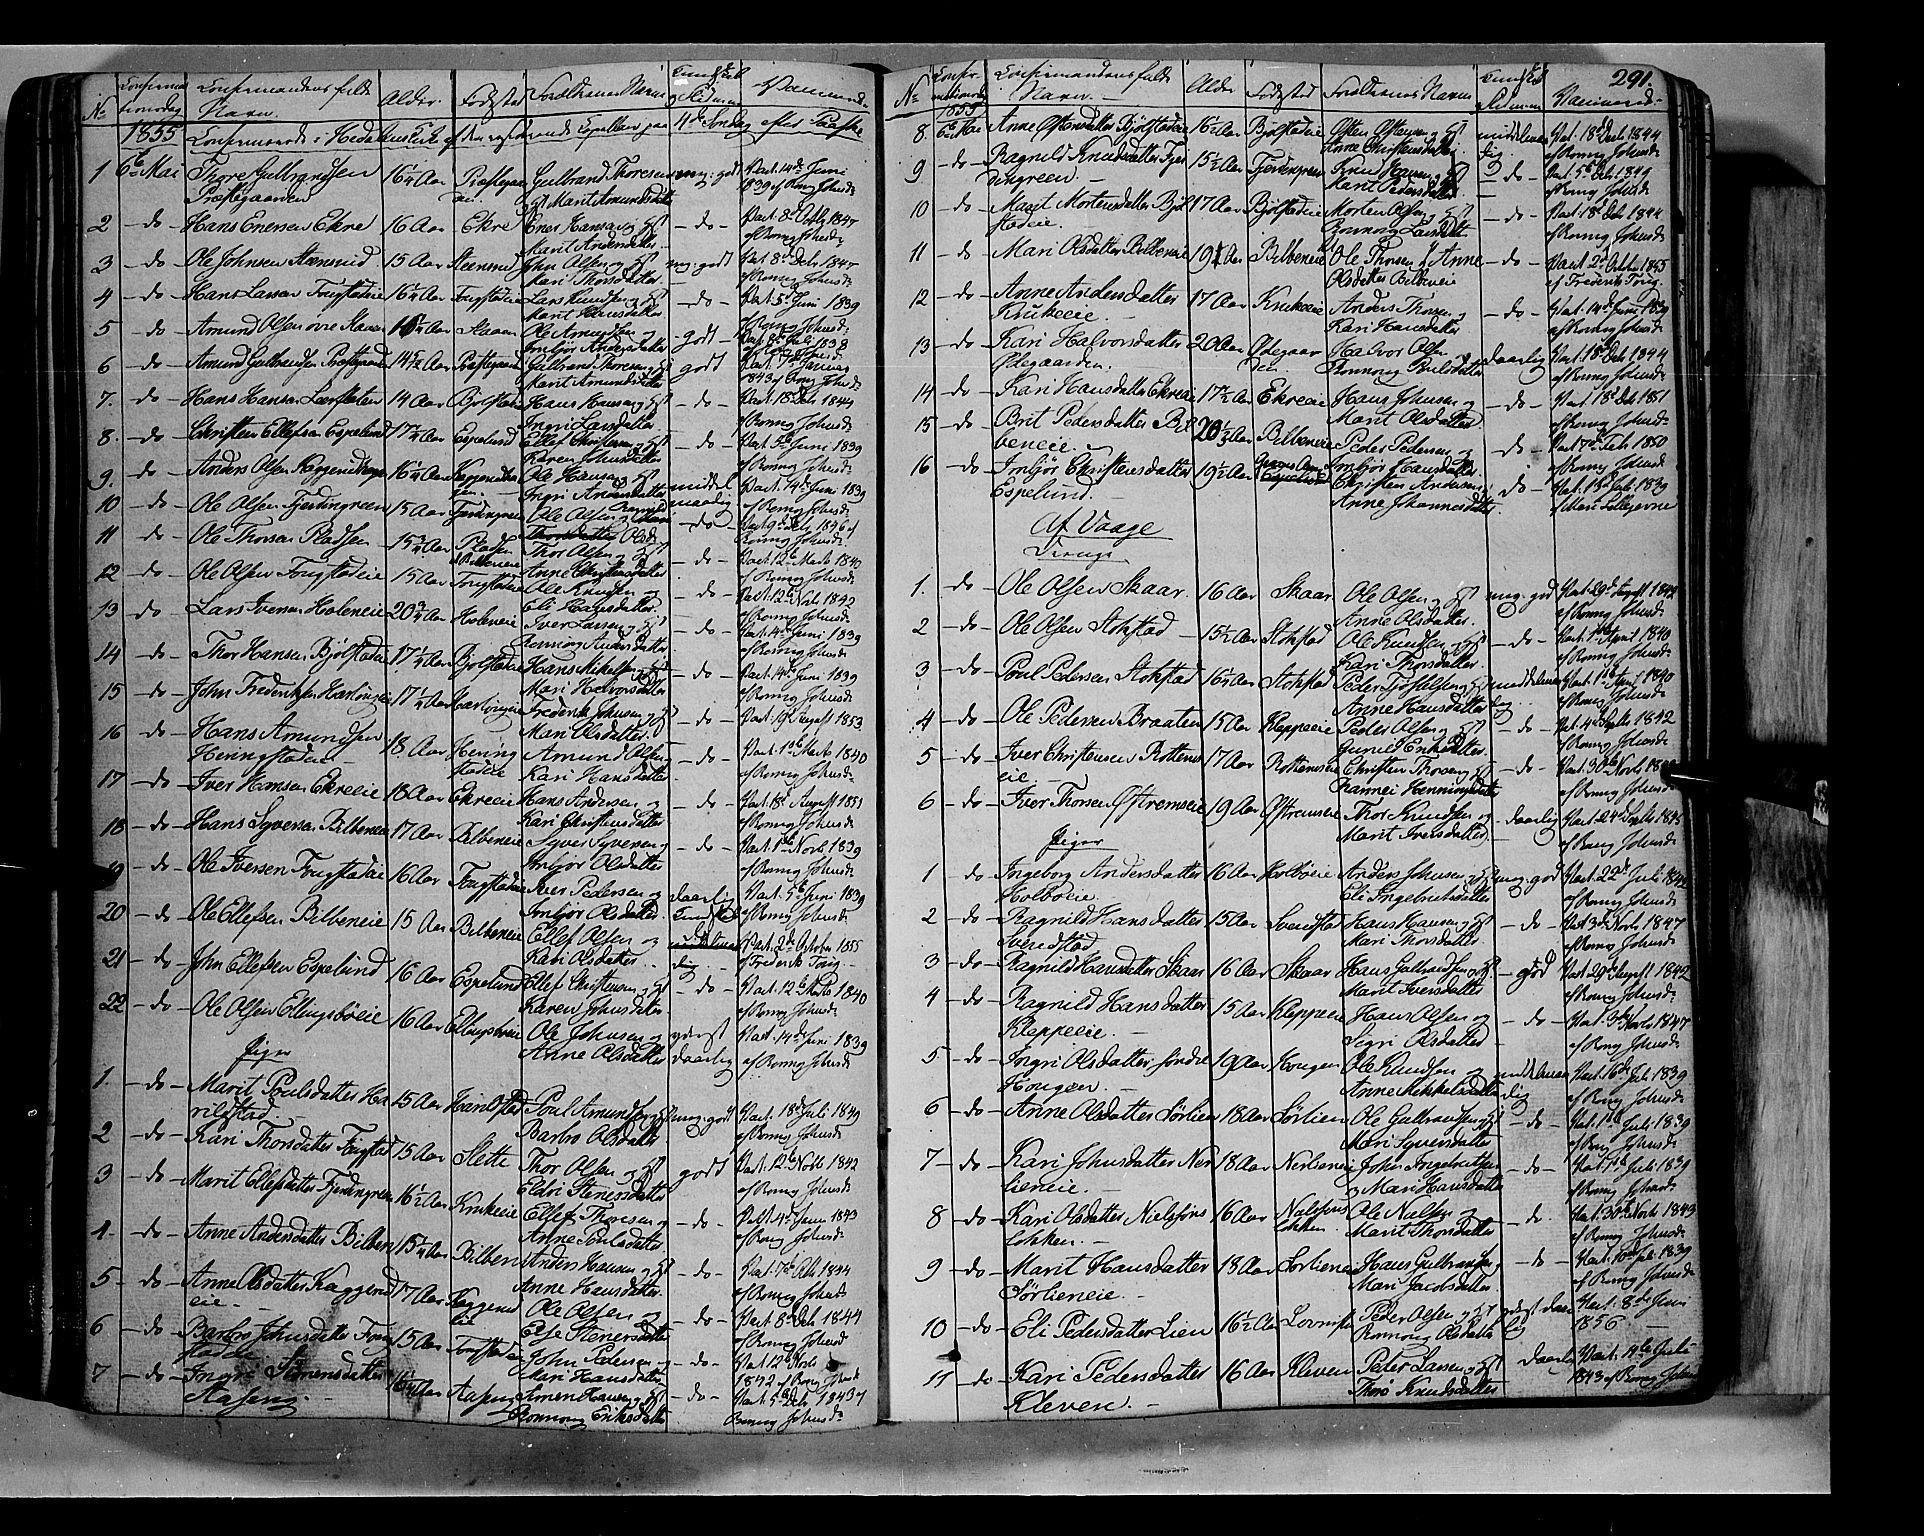 SAH, Vågå prestekontor, Ministerialbok nr. 5 /1, 1842-1856, s. 291